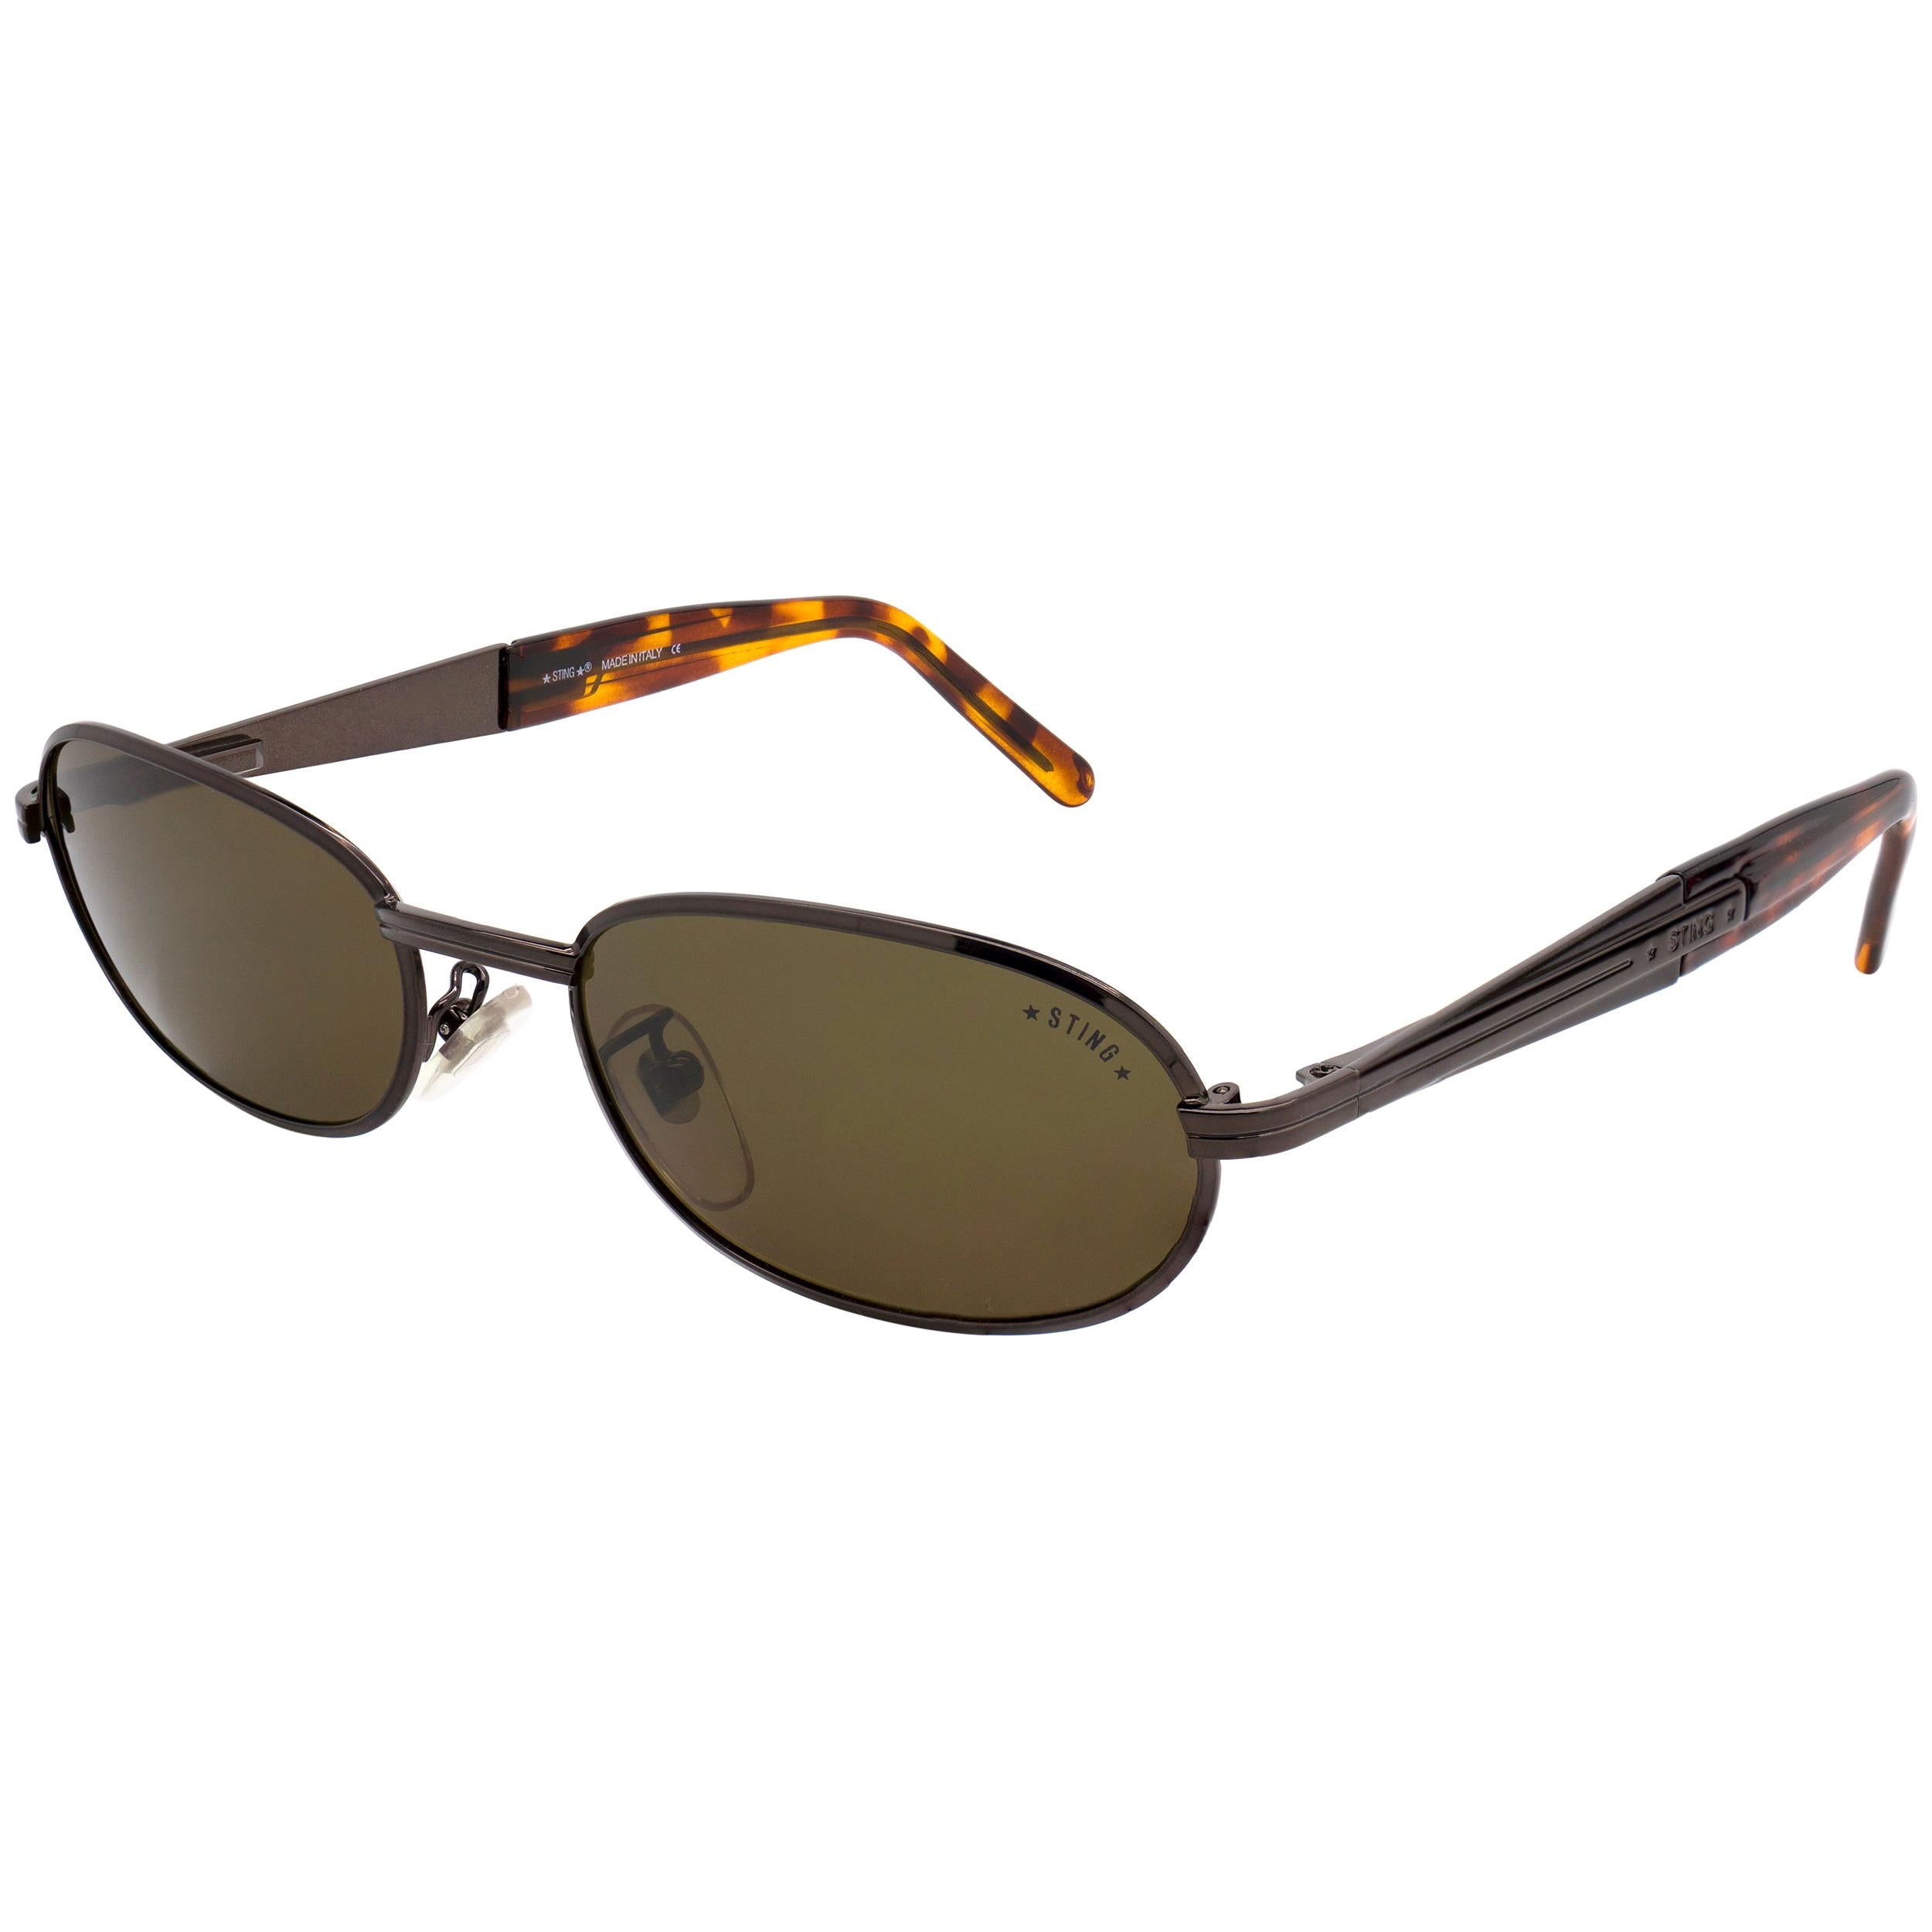 Sting oval vintage sunglasses, Italy